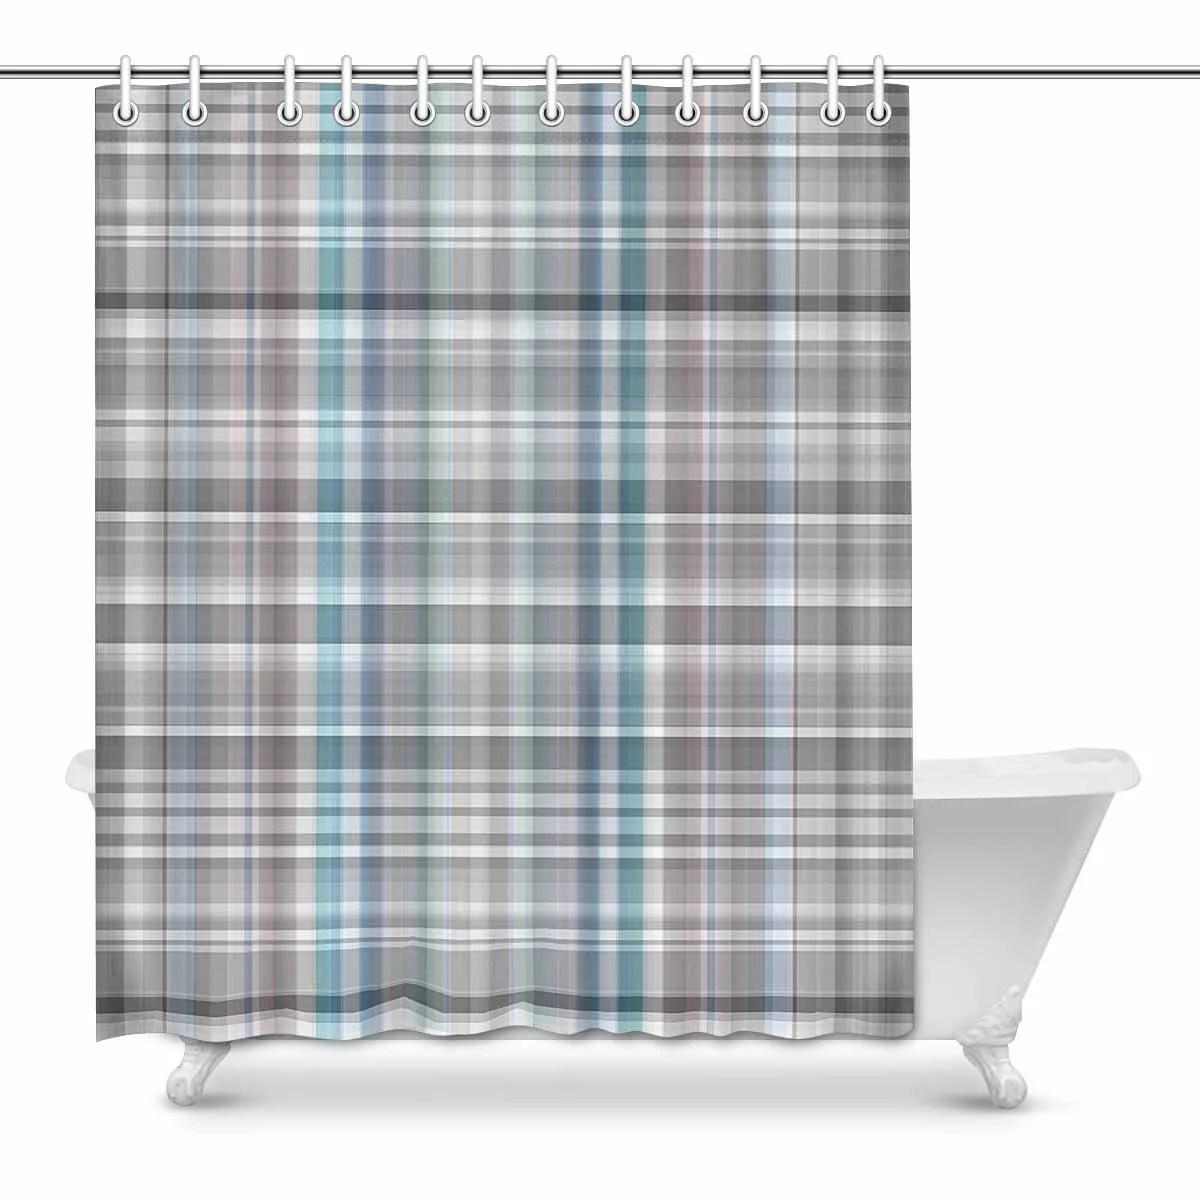 mkhert abstract latticework plaid elegant gray gingham check waterproof shower curtain decor fabric bathroom set 60x72 inch